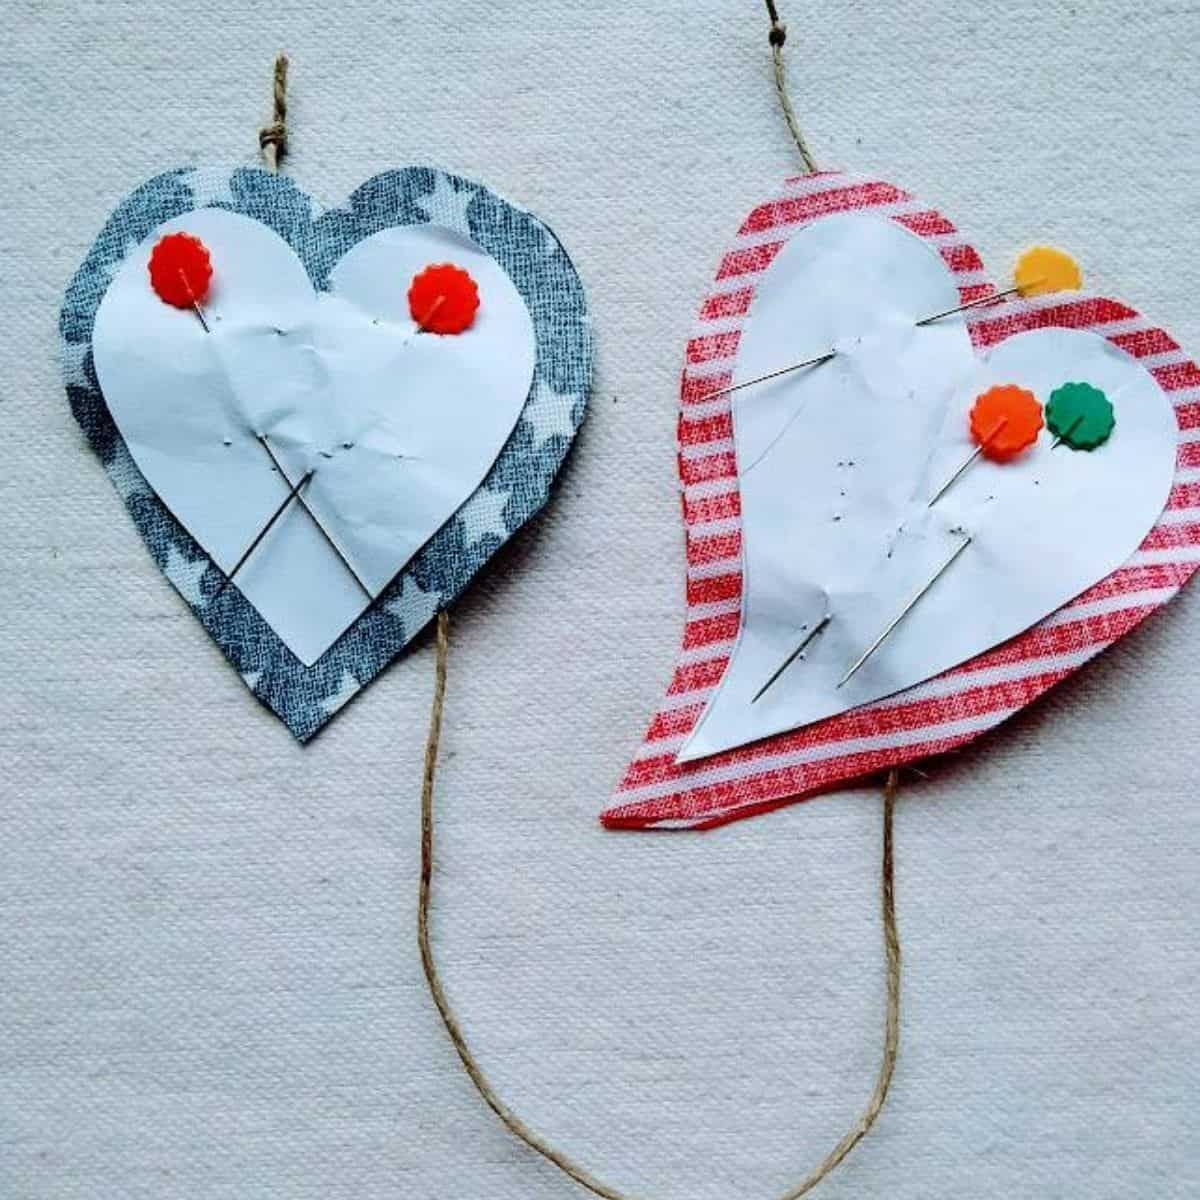 heart-shaped cutouts